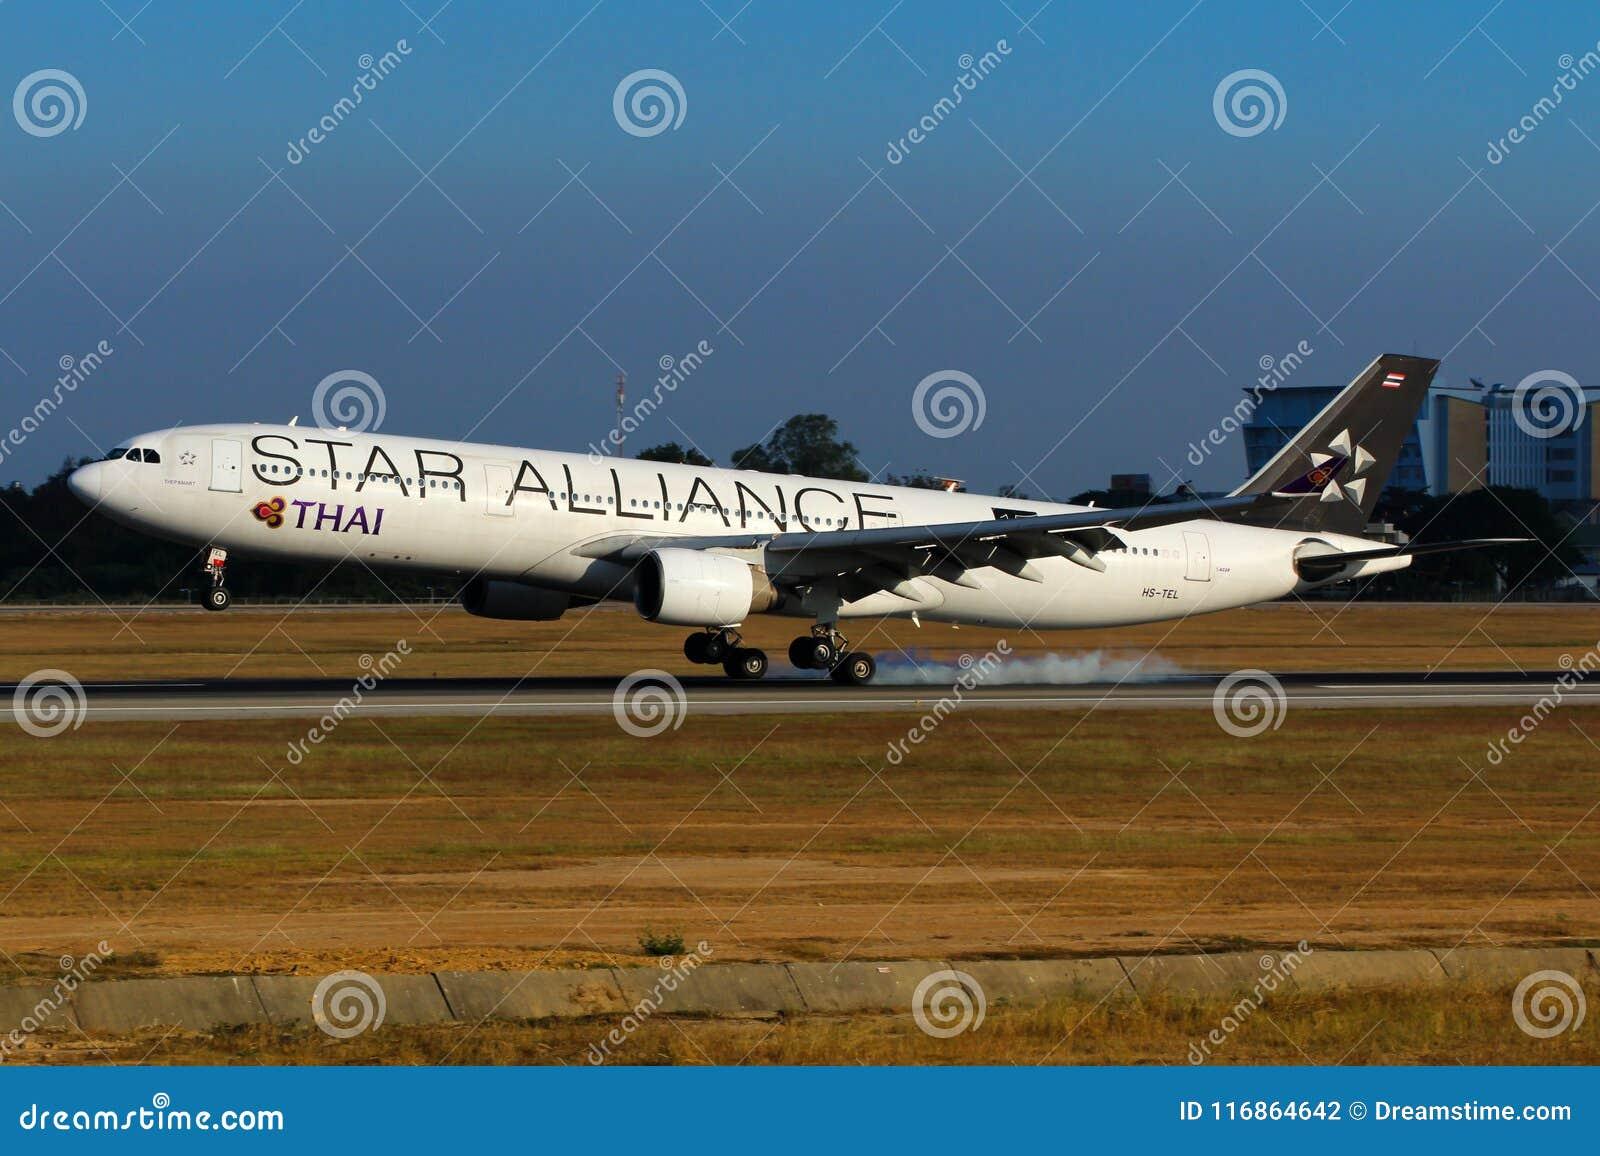 Airplane Of Thai Airways International Airbus A330 Star